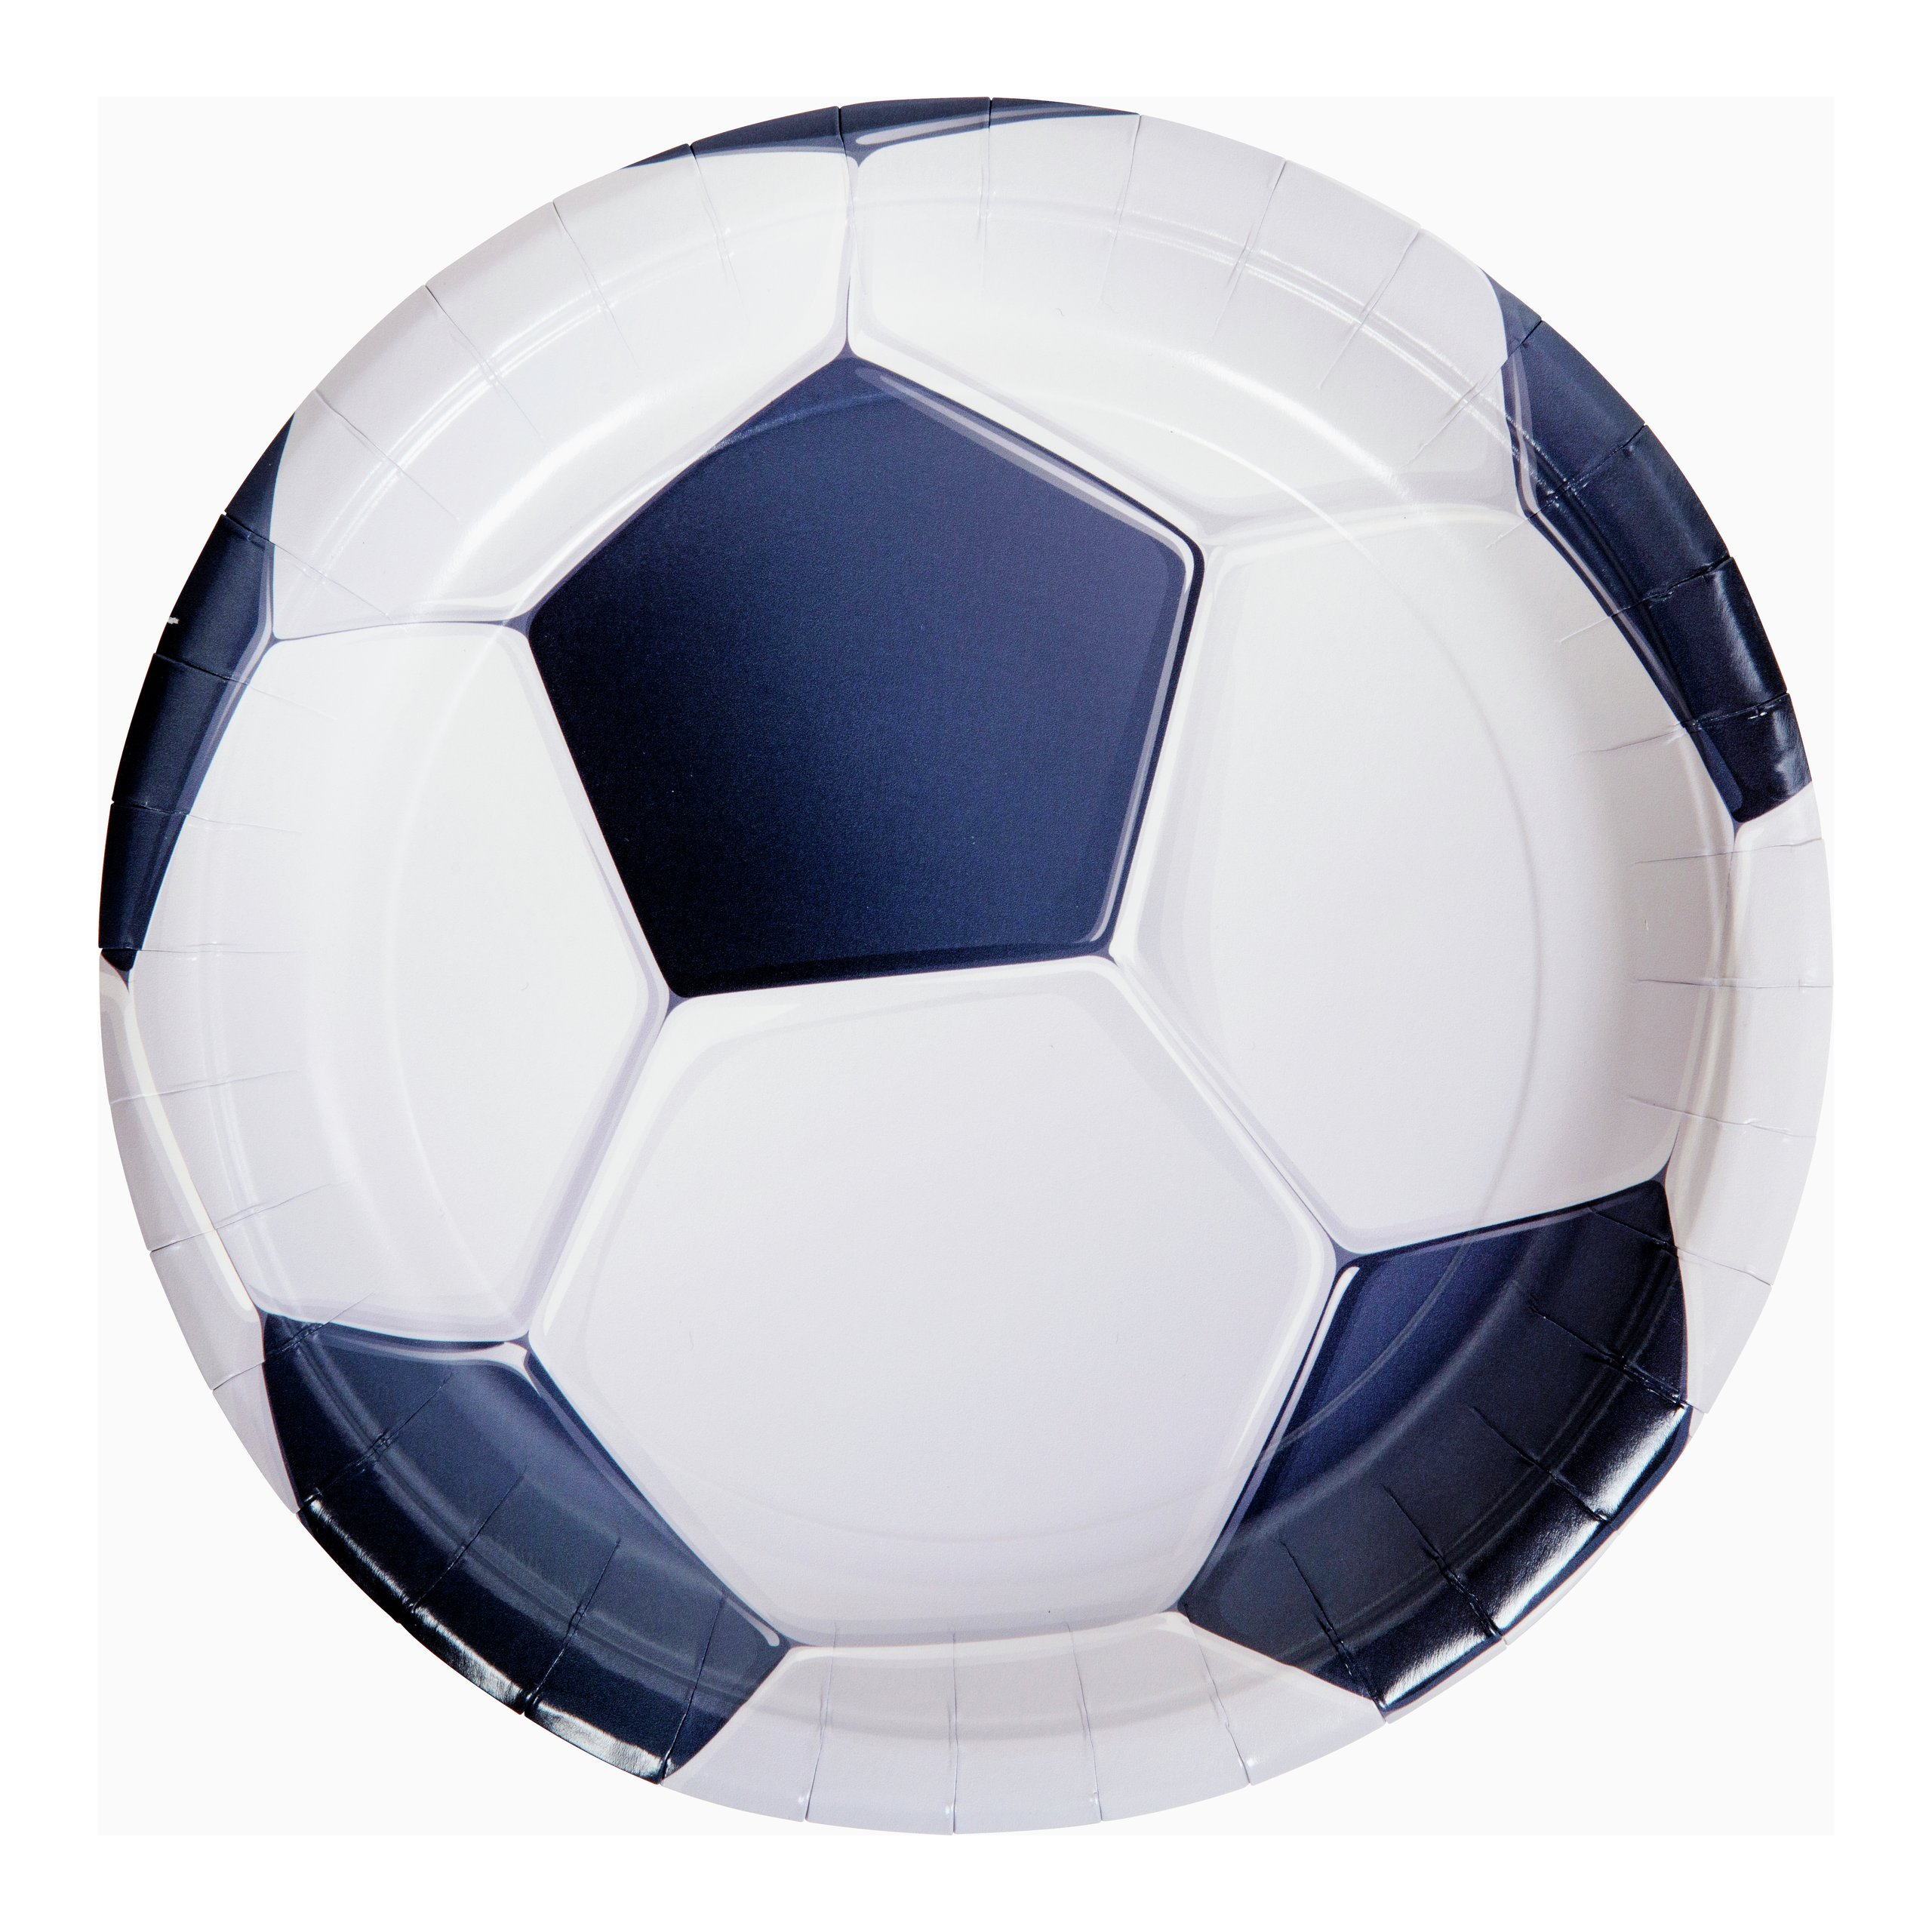 FOTBALL TALLERKEN 8PK Ø22,5CM-BUR2042